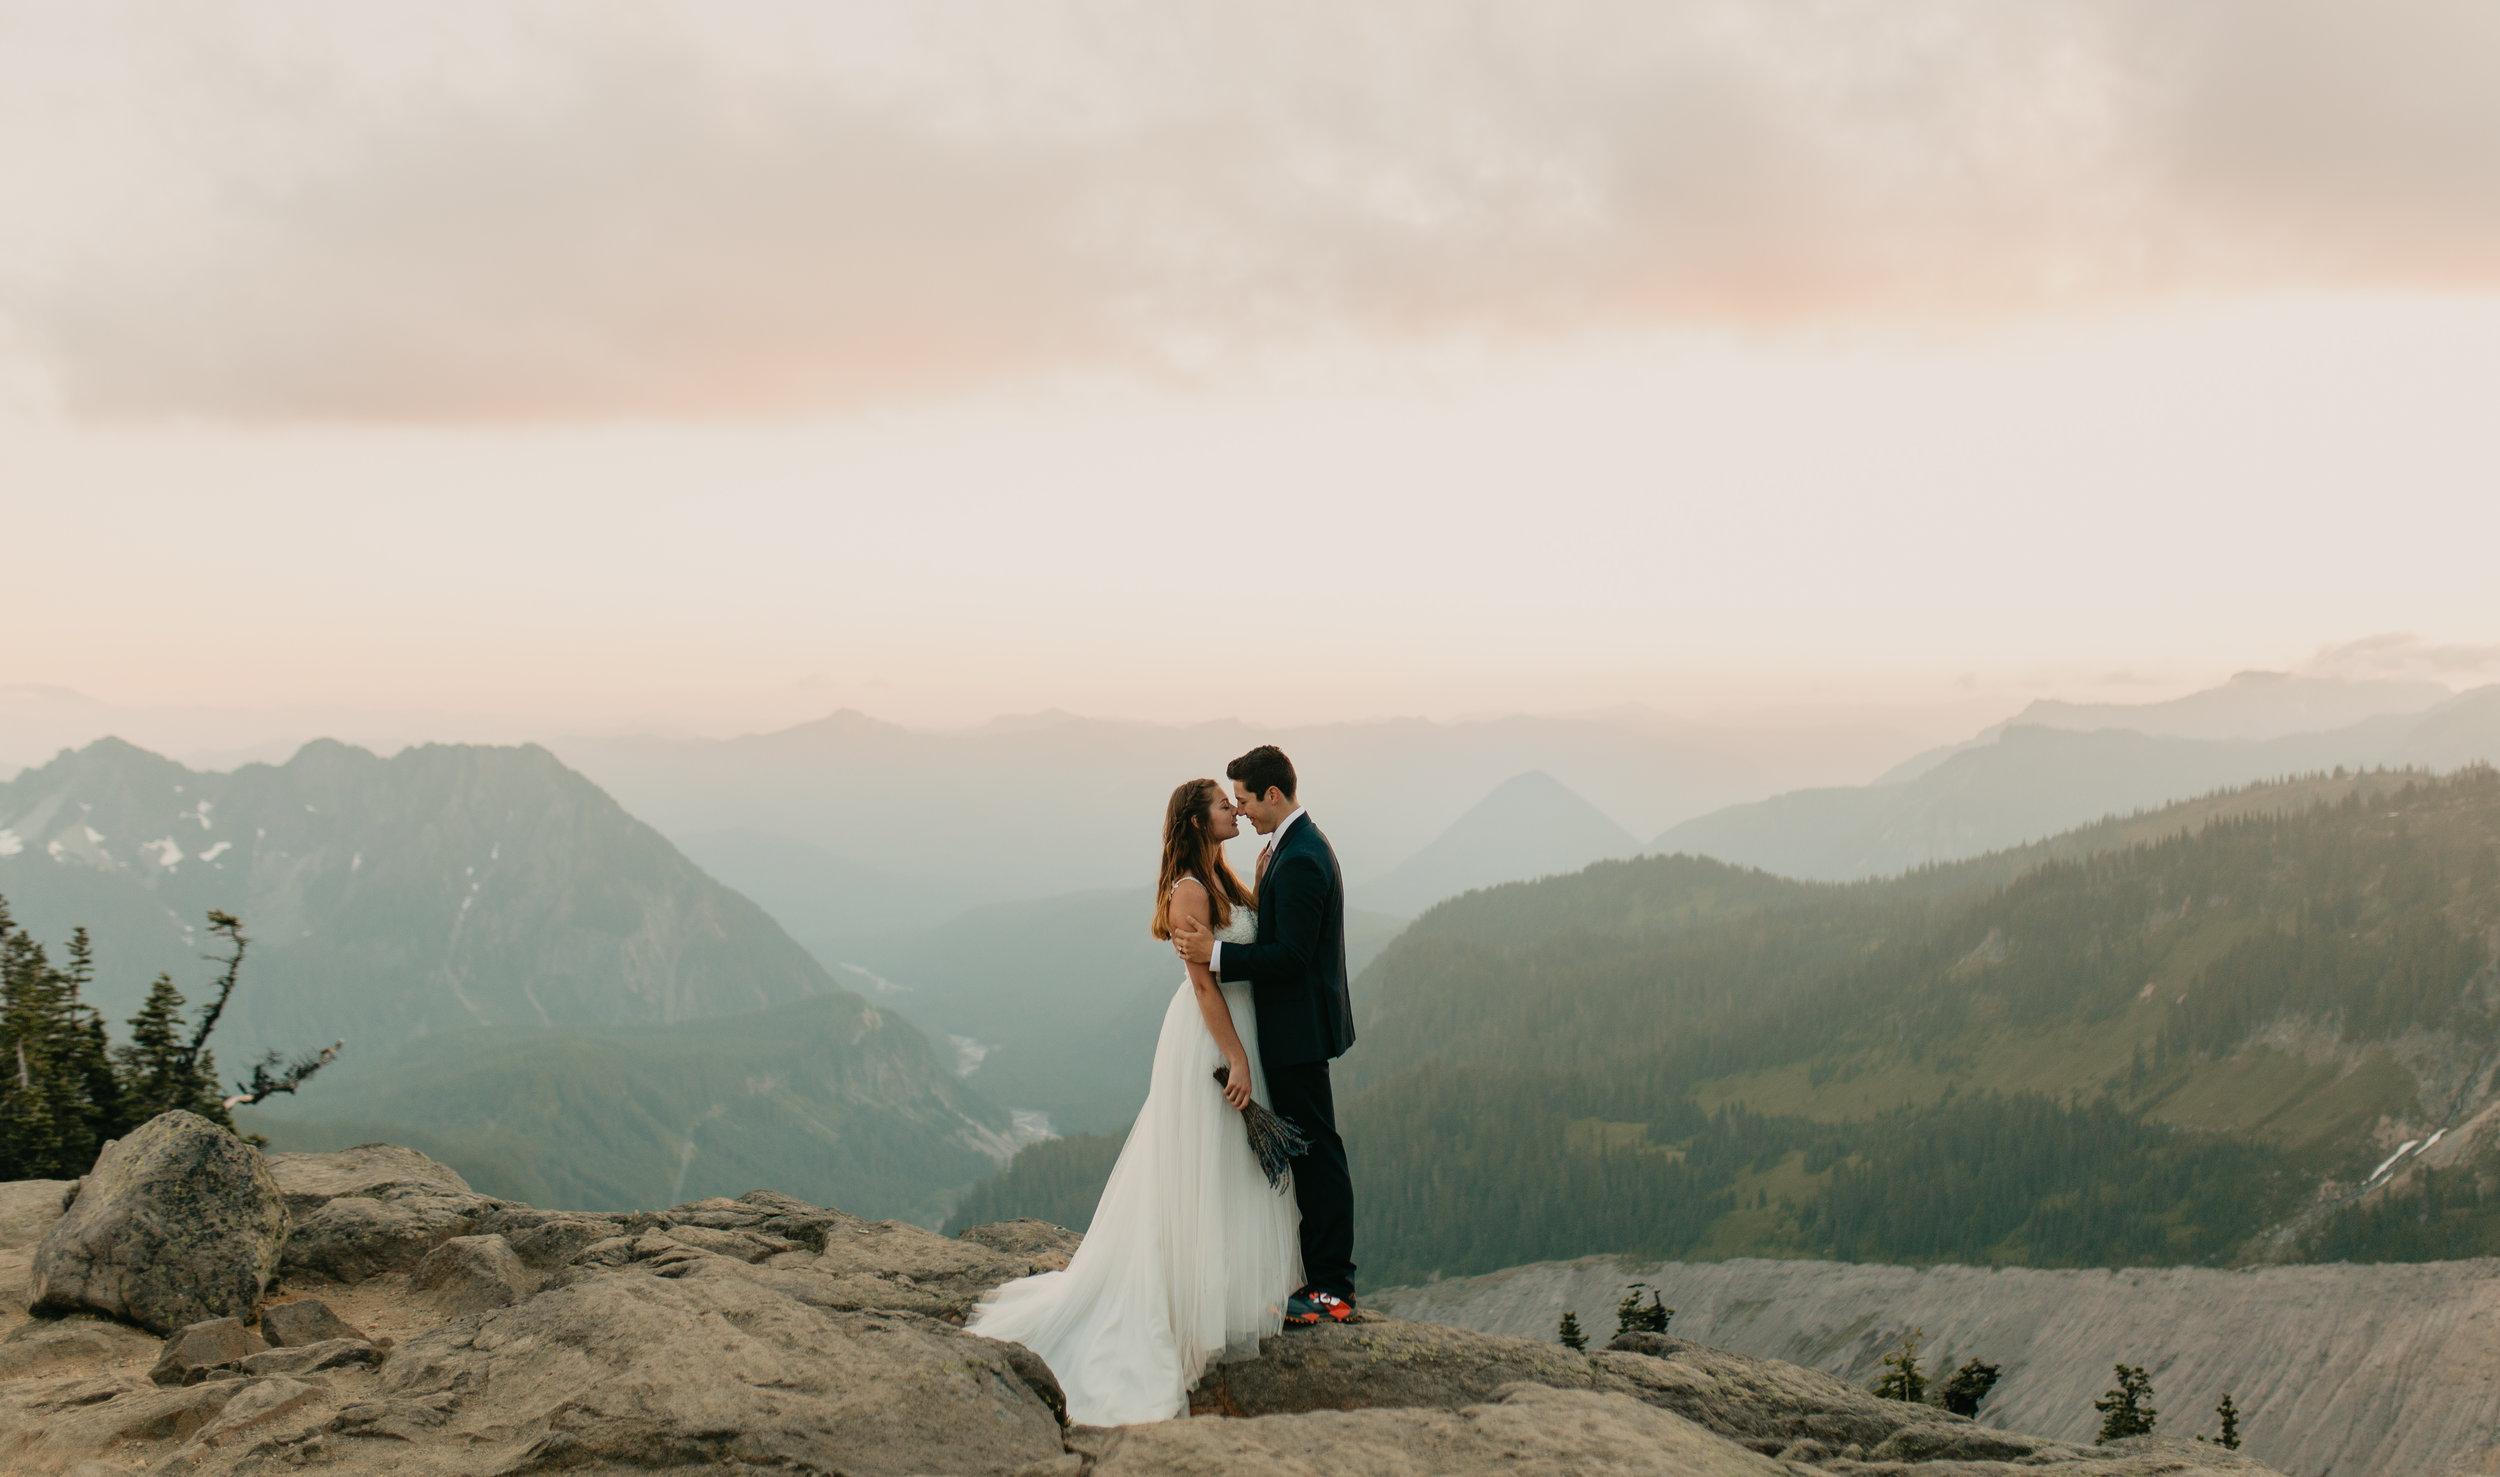 Nicole-Daacke-Photography-Mt-Rainier-elopement-photographer-washington-mountain-epic-wedding-photography-wildflowers-at-rainier-pine-tree-cloudy-summer-day-at-mountain-rainier-54.jpg